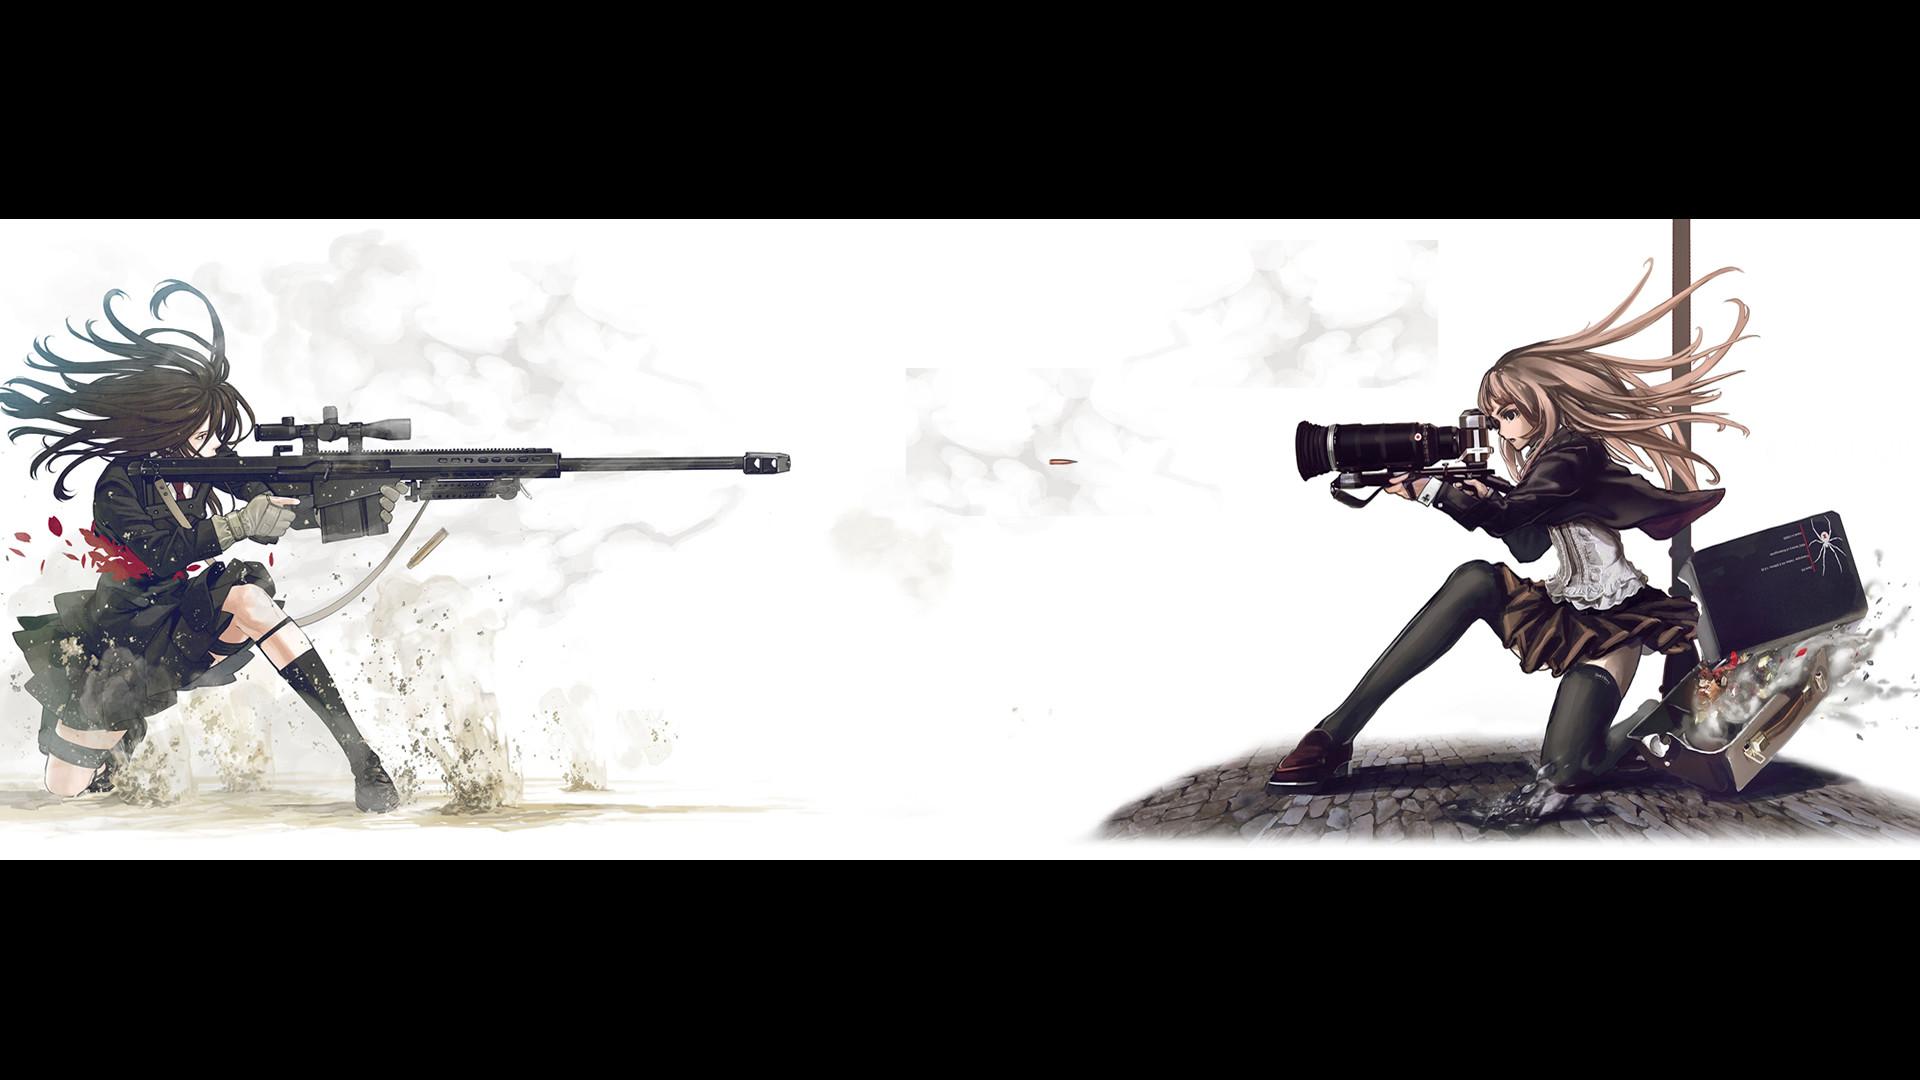 school uniforms, snipers, Speed Grapher, cameras, anime, simple background  – Free Wallpaper / WallpaperJam.com